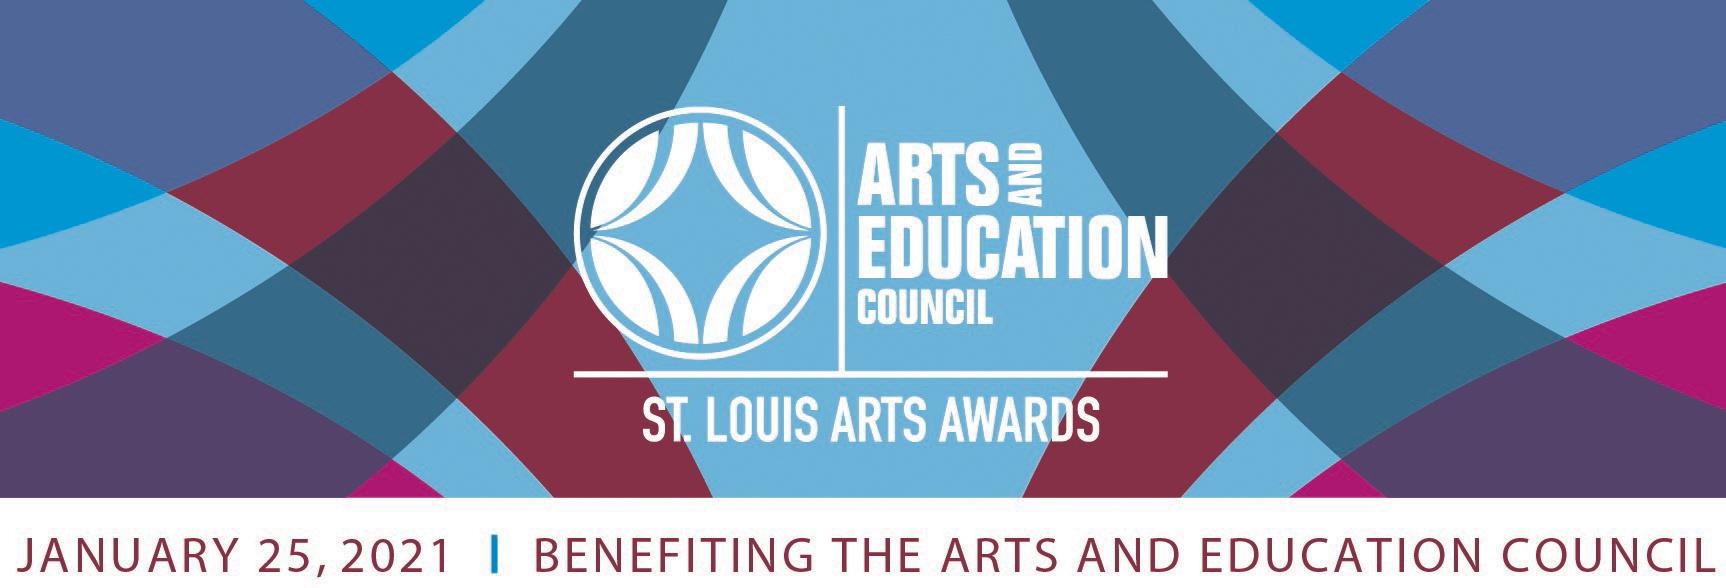 2021 St. Louis Arts Awards header